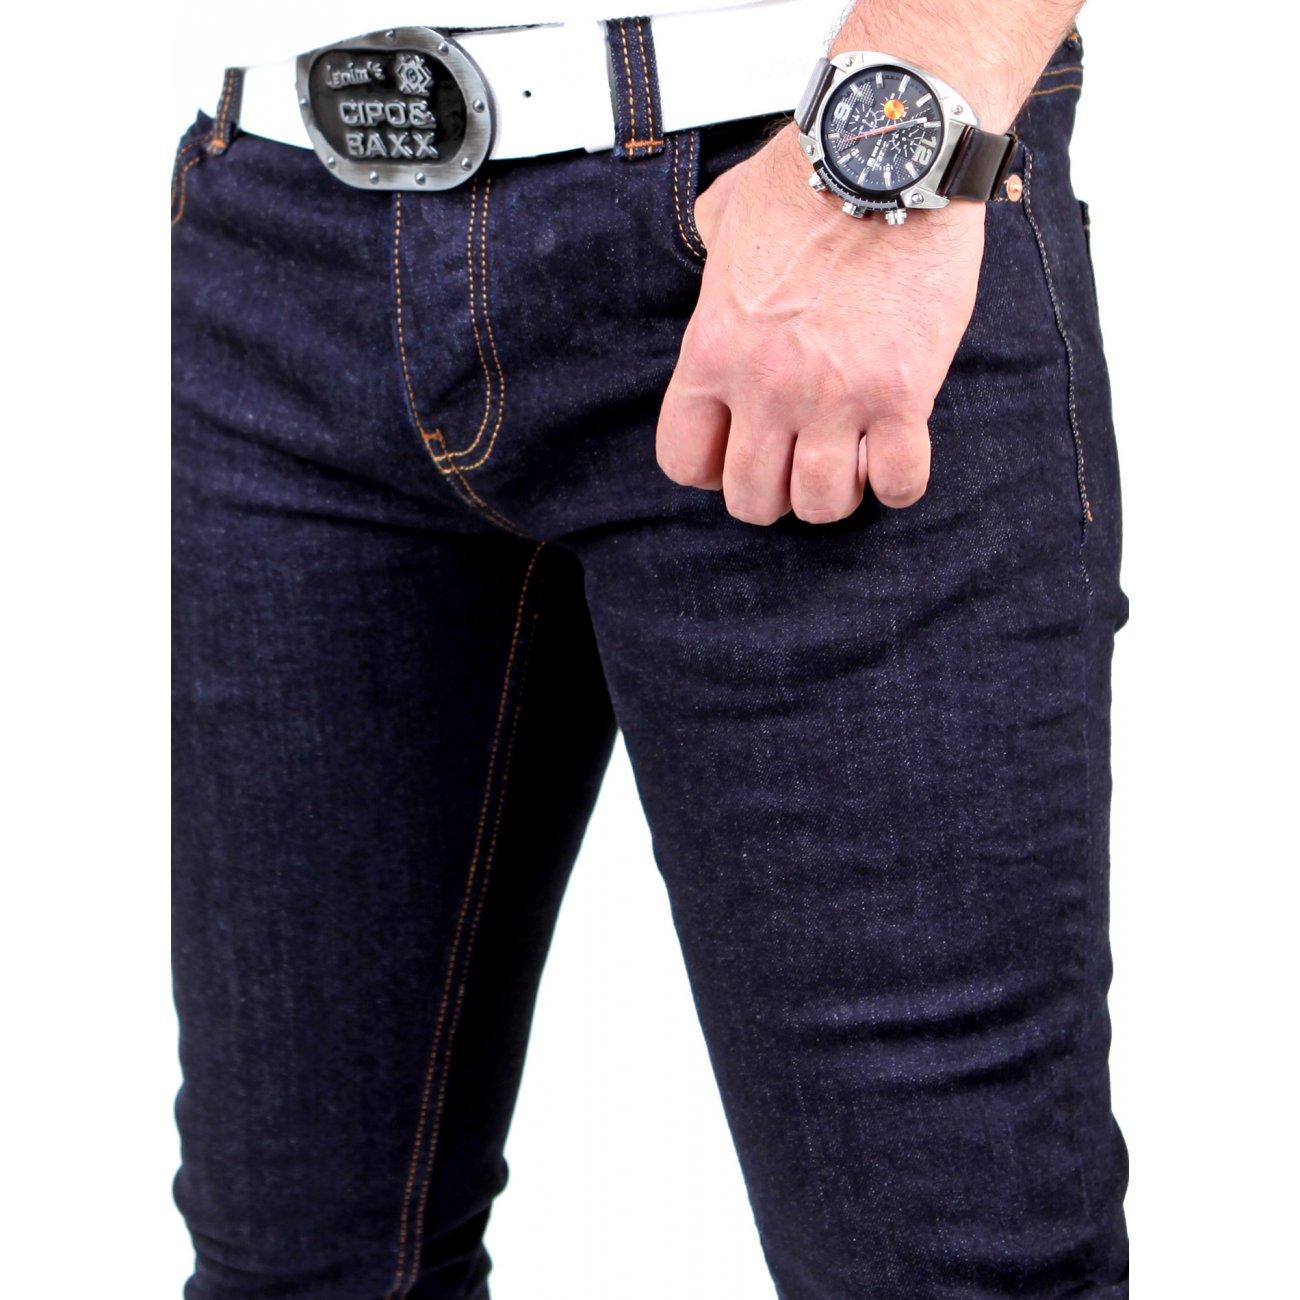 enge jeans blau tazzio denim 500 skinny jeans kaufen. Black Bedroom Furniture Sets. Home Design Ideas